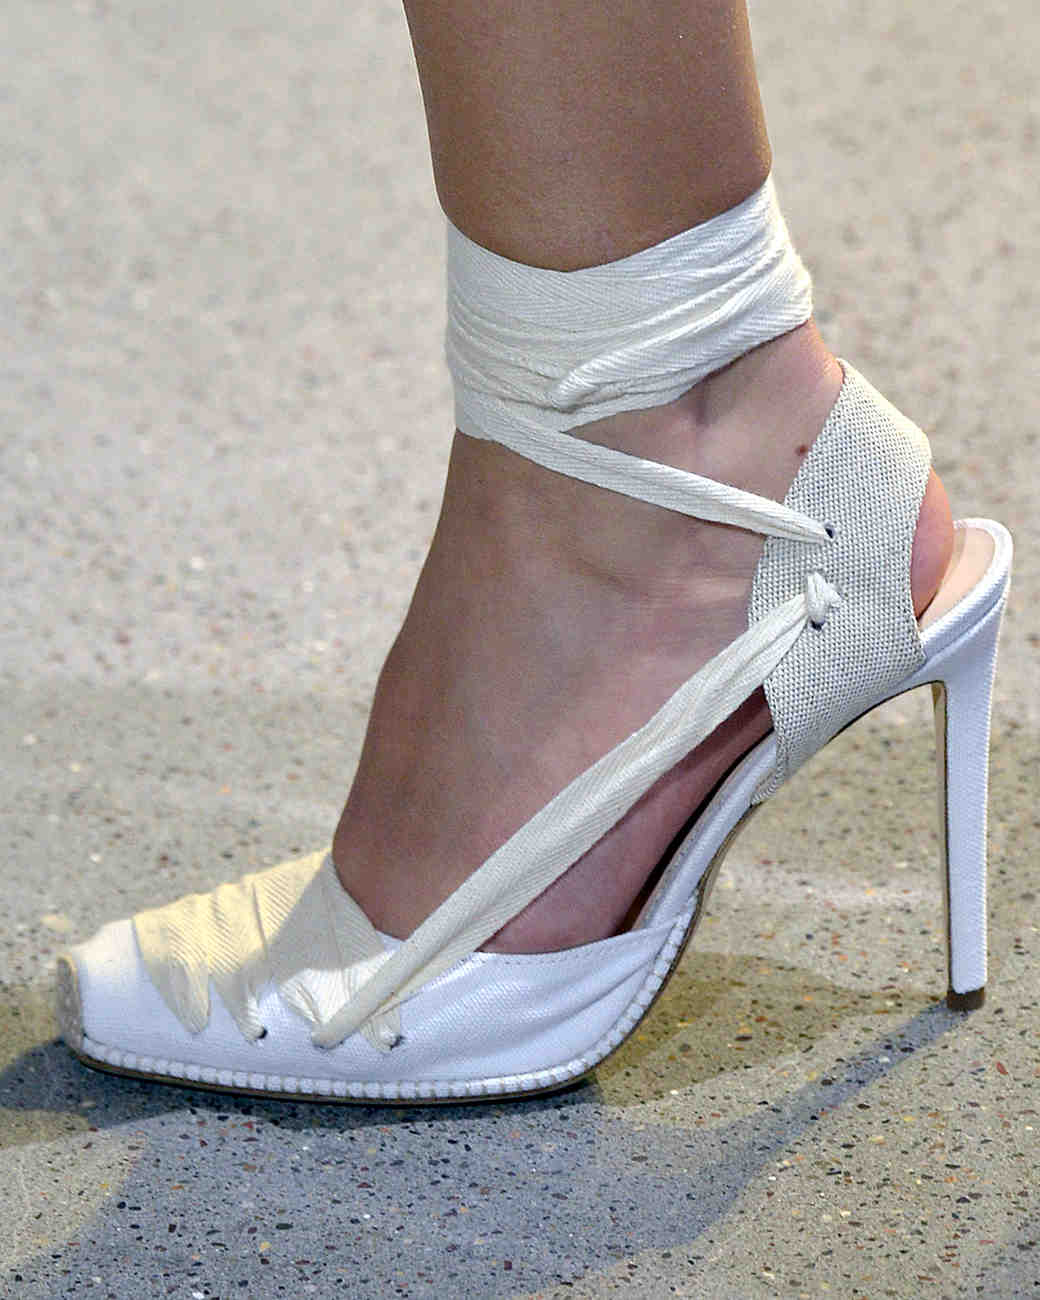 sp16-nyfw-bridal-accessories-altuzarra-shoes-0915.jpg